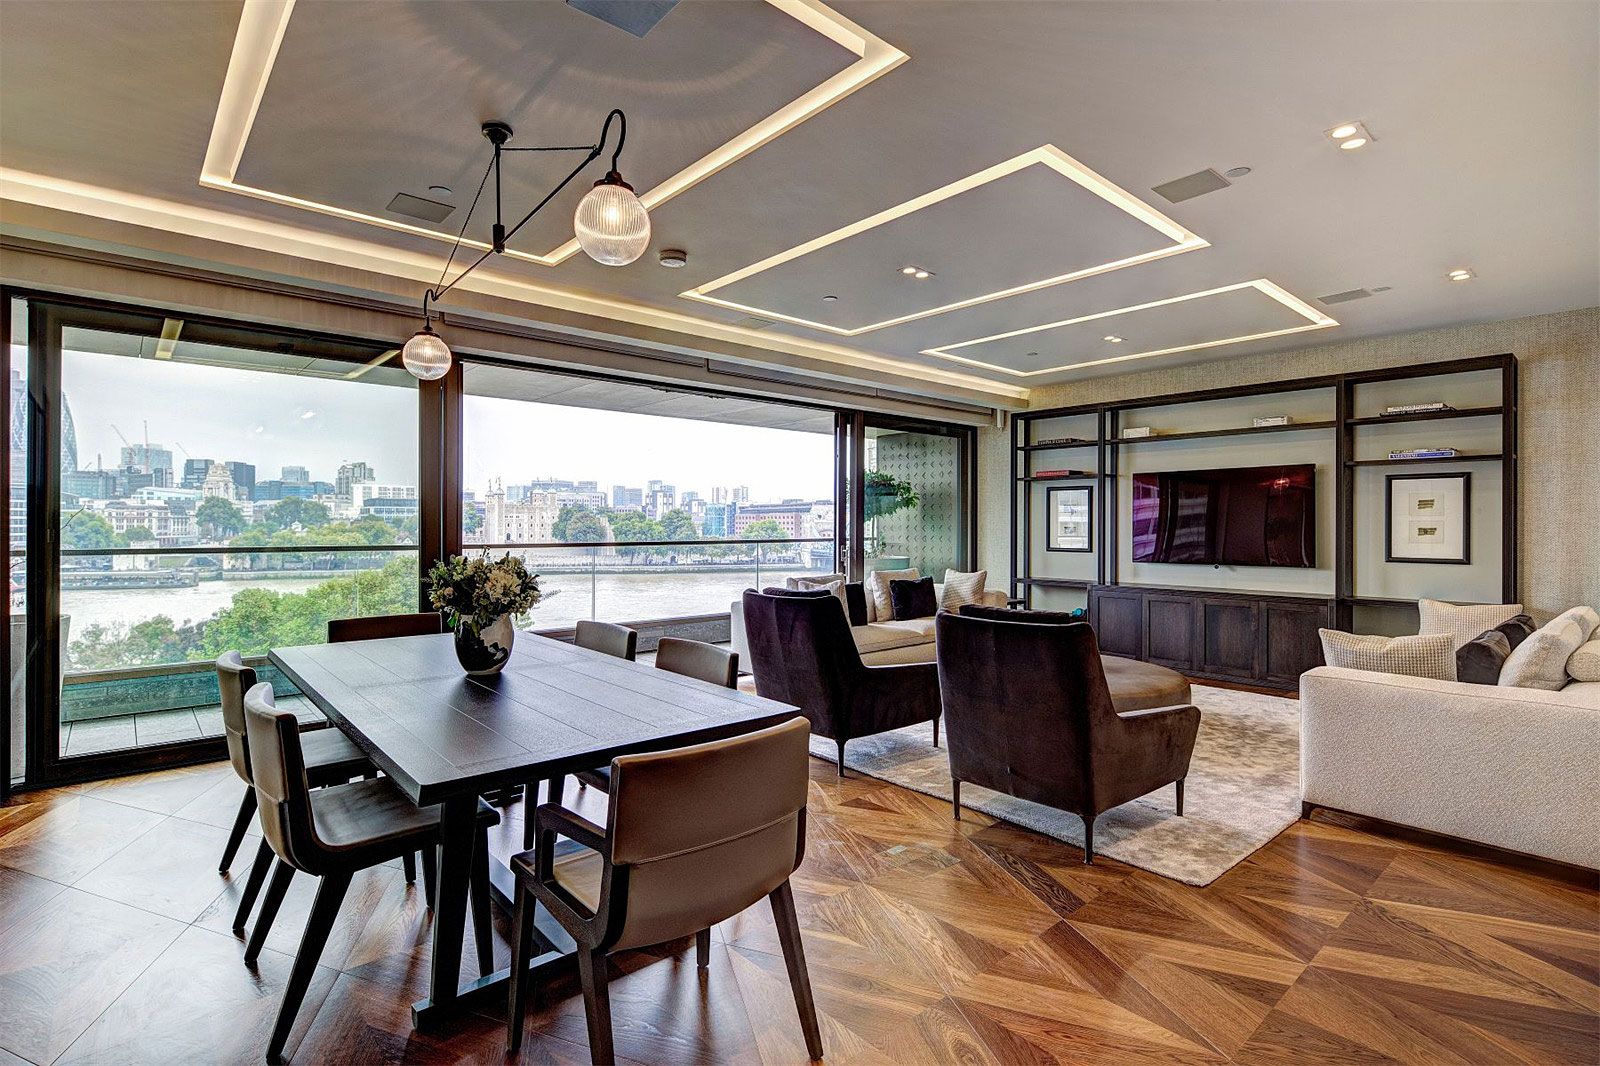 Blenheim House, One Tower Bridge, London, United Kingdom | Shereen Malik, United Kingdom Sotheby's International Realty |FINEST RESIDENCES - 3